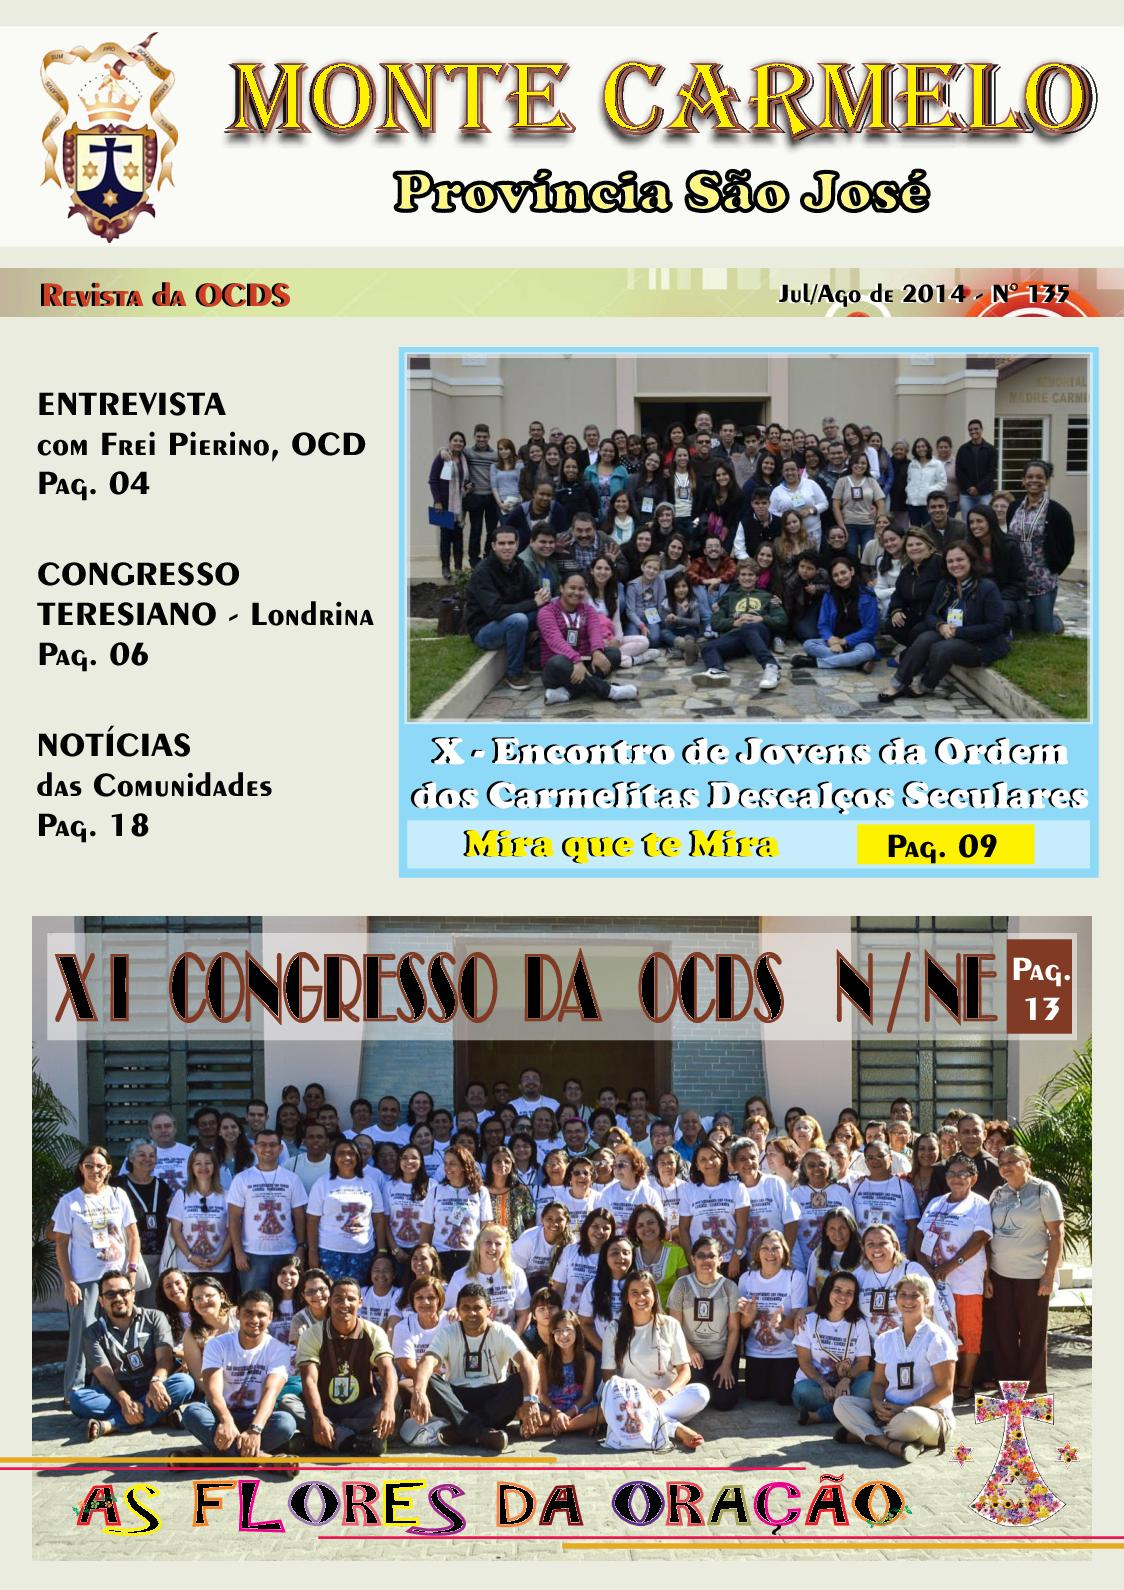 cf011004d Calaméo - Monte Carmelo Nº 135